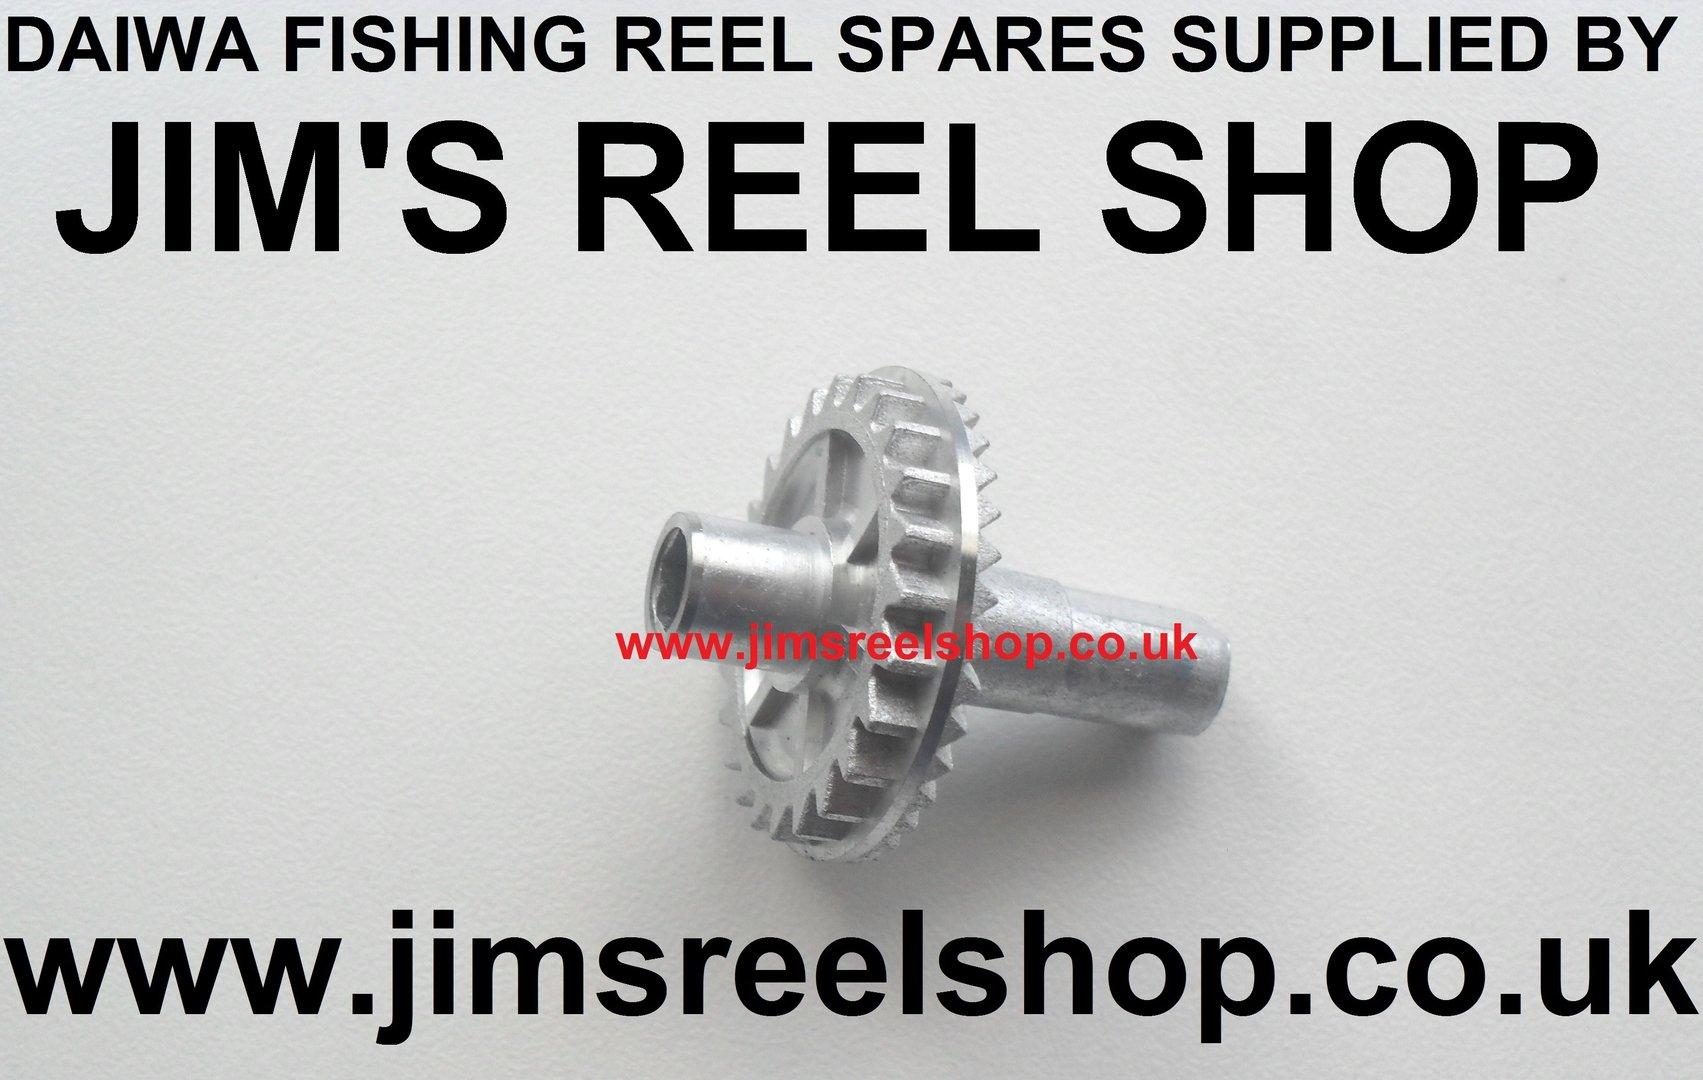 e789bad9cd5 DAIWA 125M CLOSED FACE REEL DRIVE GEAR E07-8301 - Jim's Reel Shop